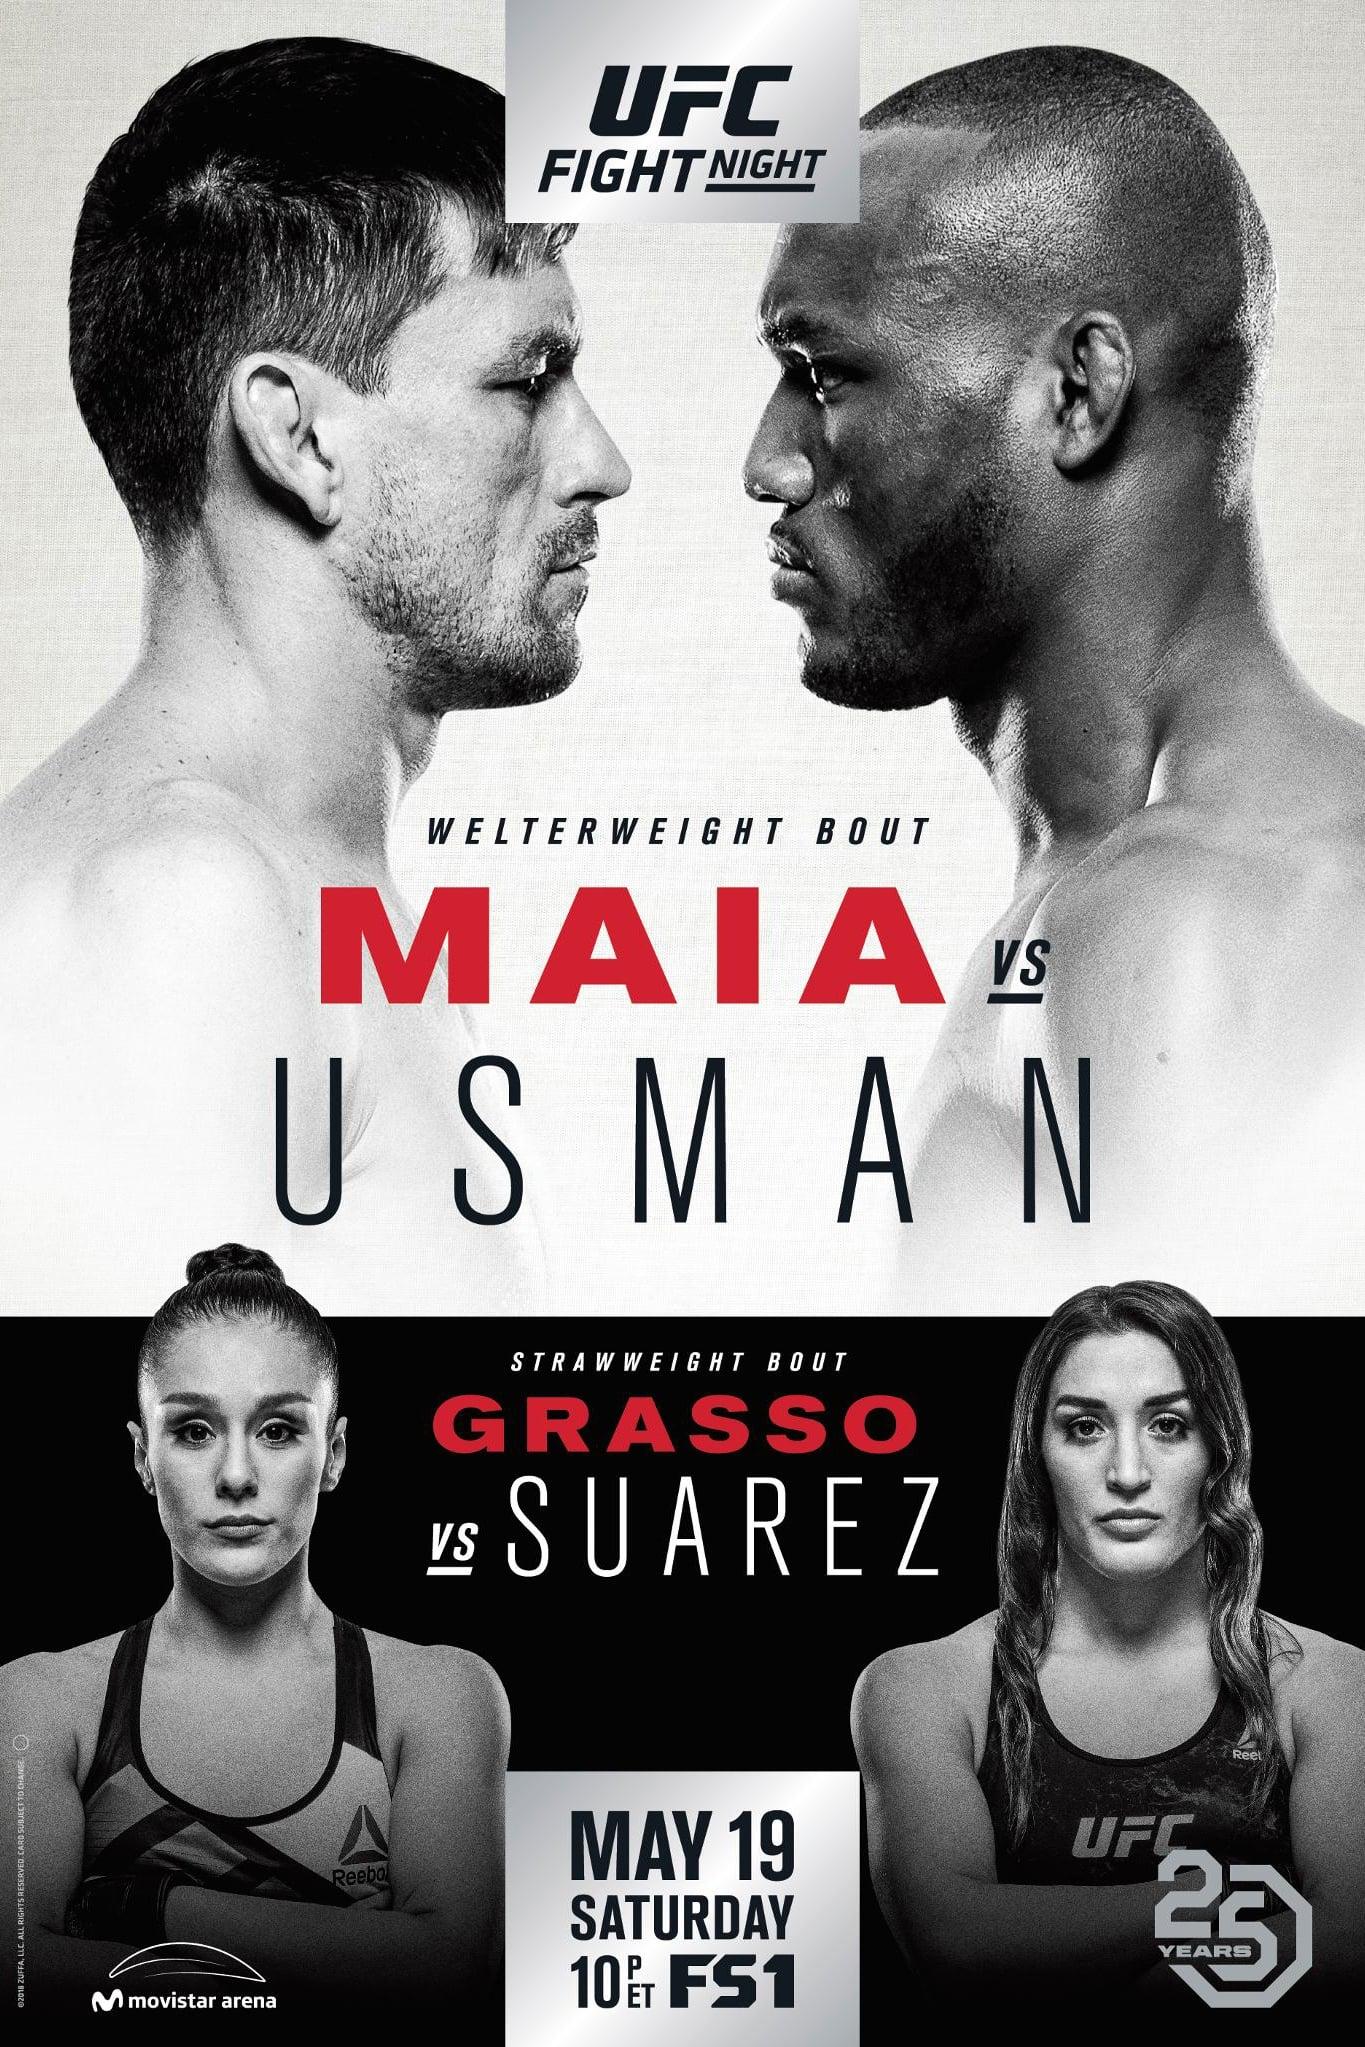 UFC Fight Night 129: Maia vs. Usman